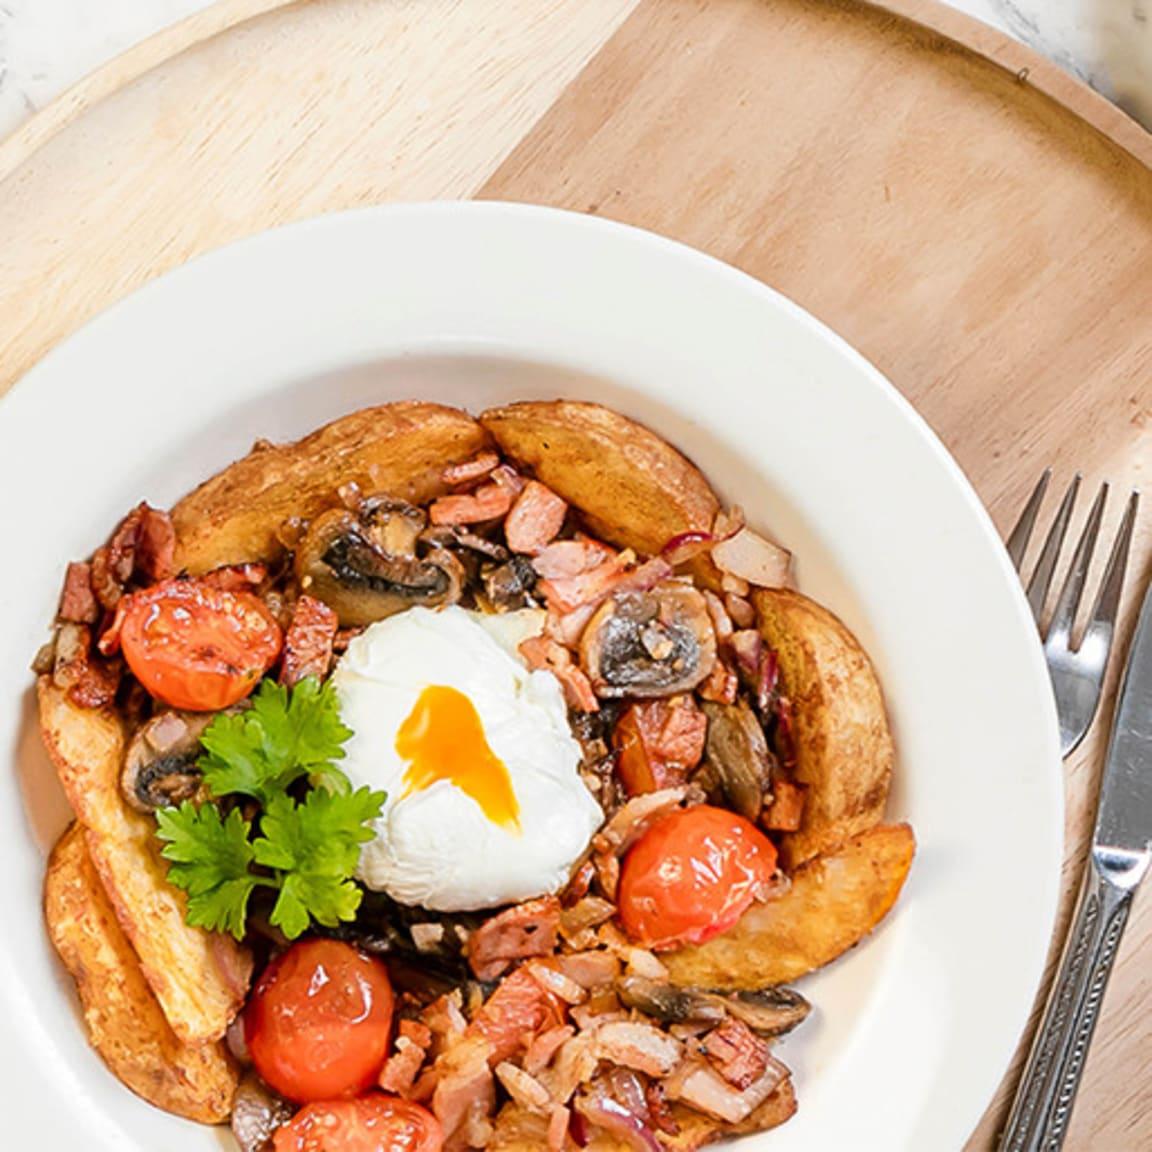 Shingle Inn: $13.90 Potato hash